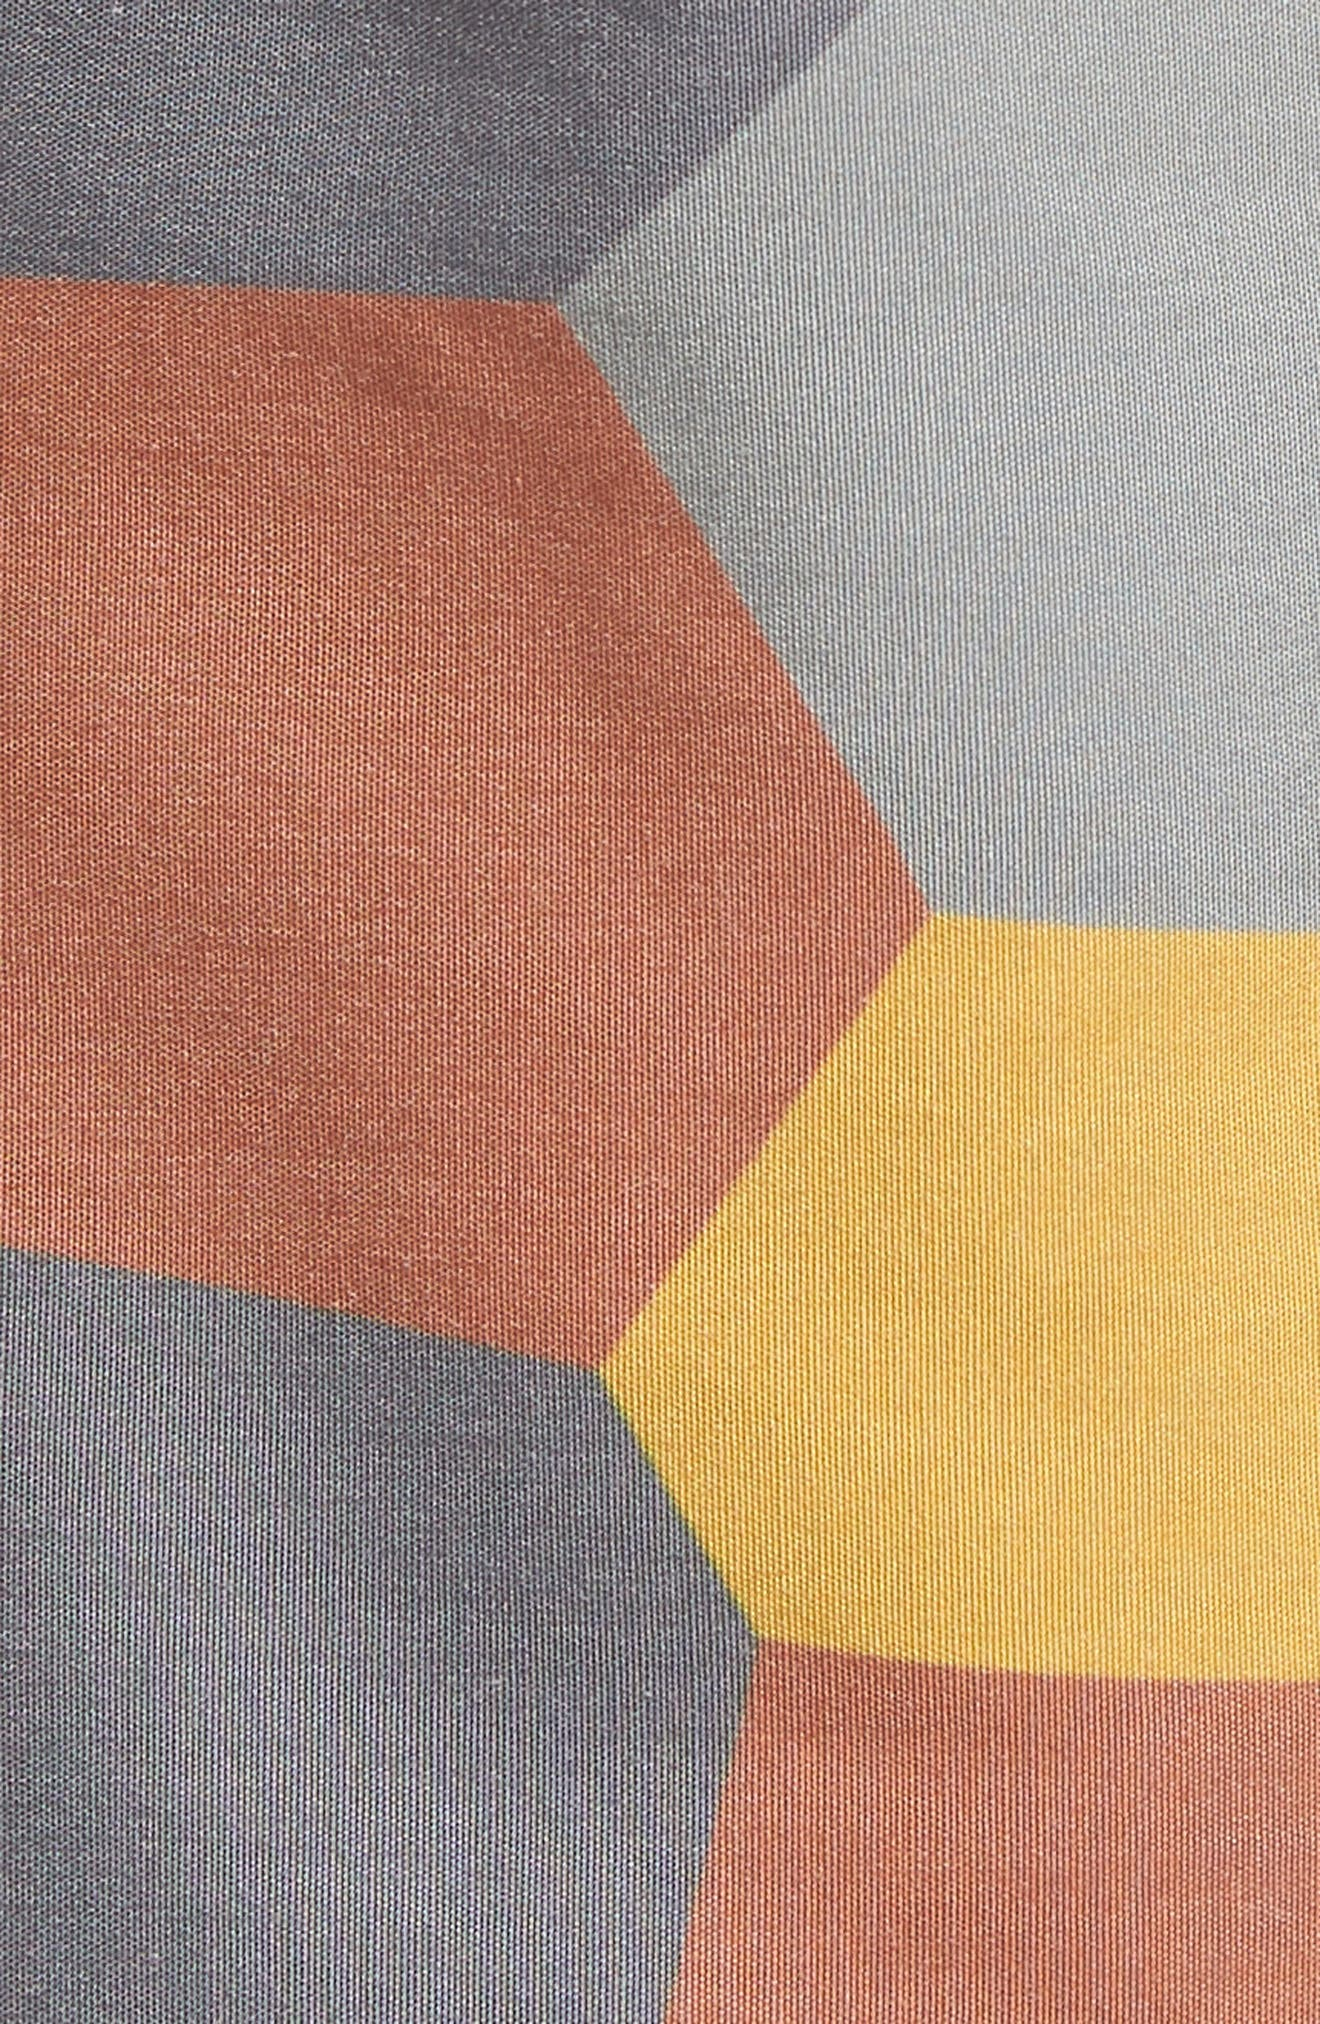 Belmont Pool Shorts,                             Alternate thumbnail 5, color,                             Coastal Orange Geo Camo